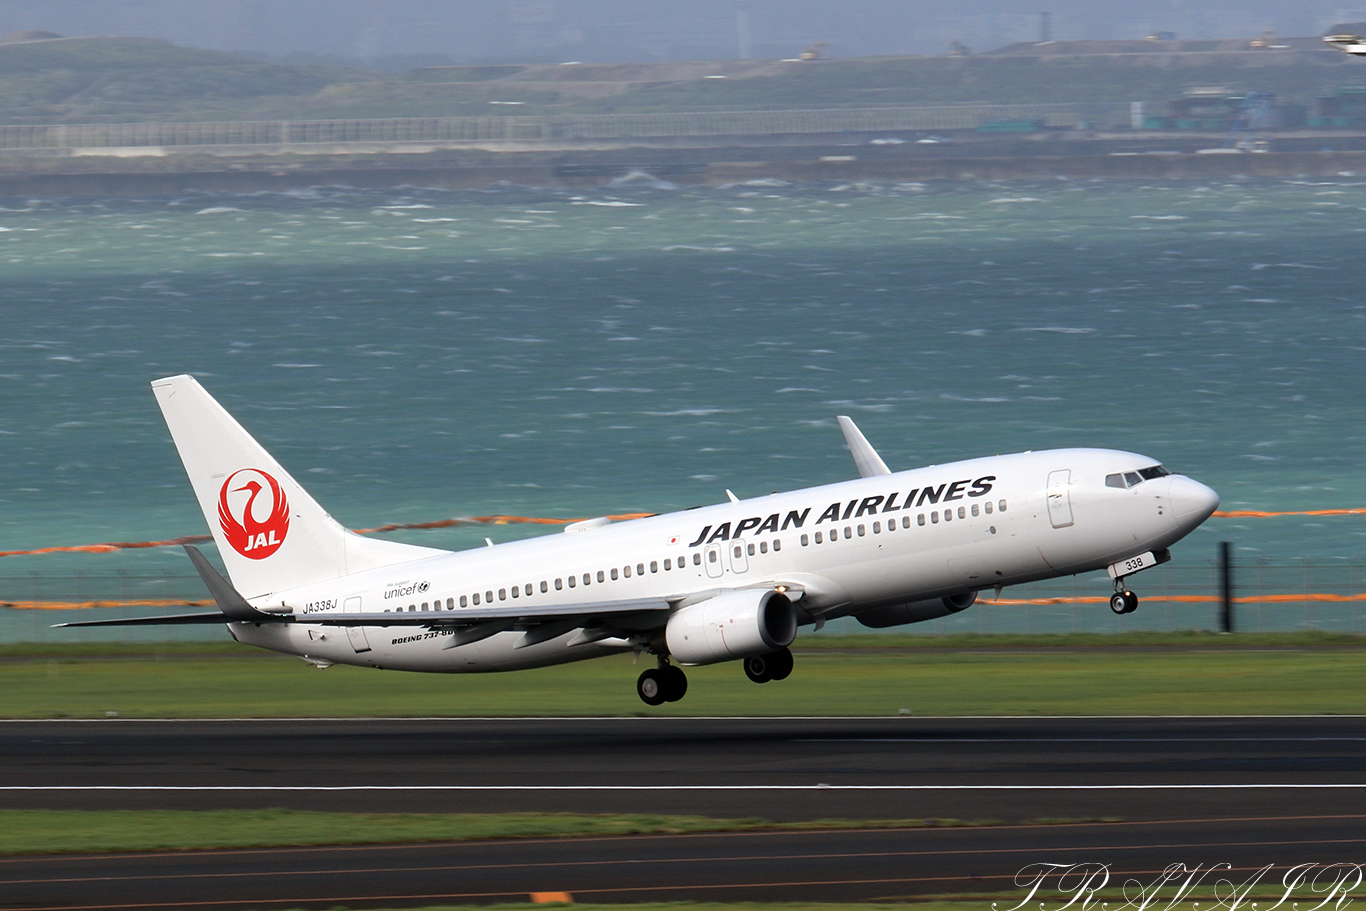 JL/JAL/日本航空 JL483 B737-800 JA338J